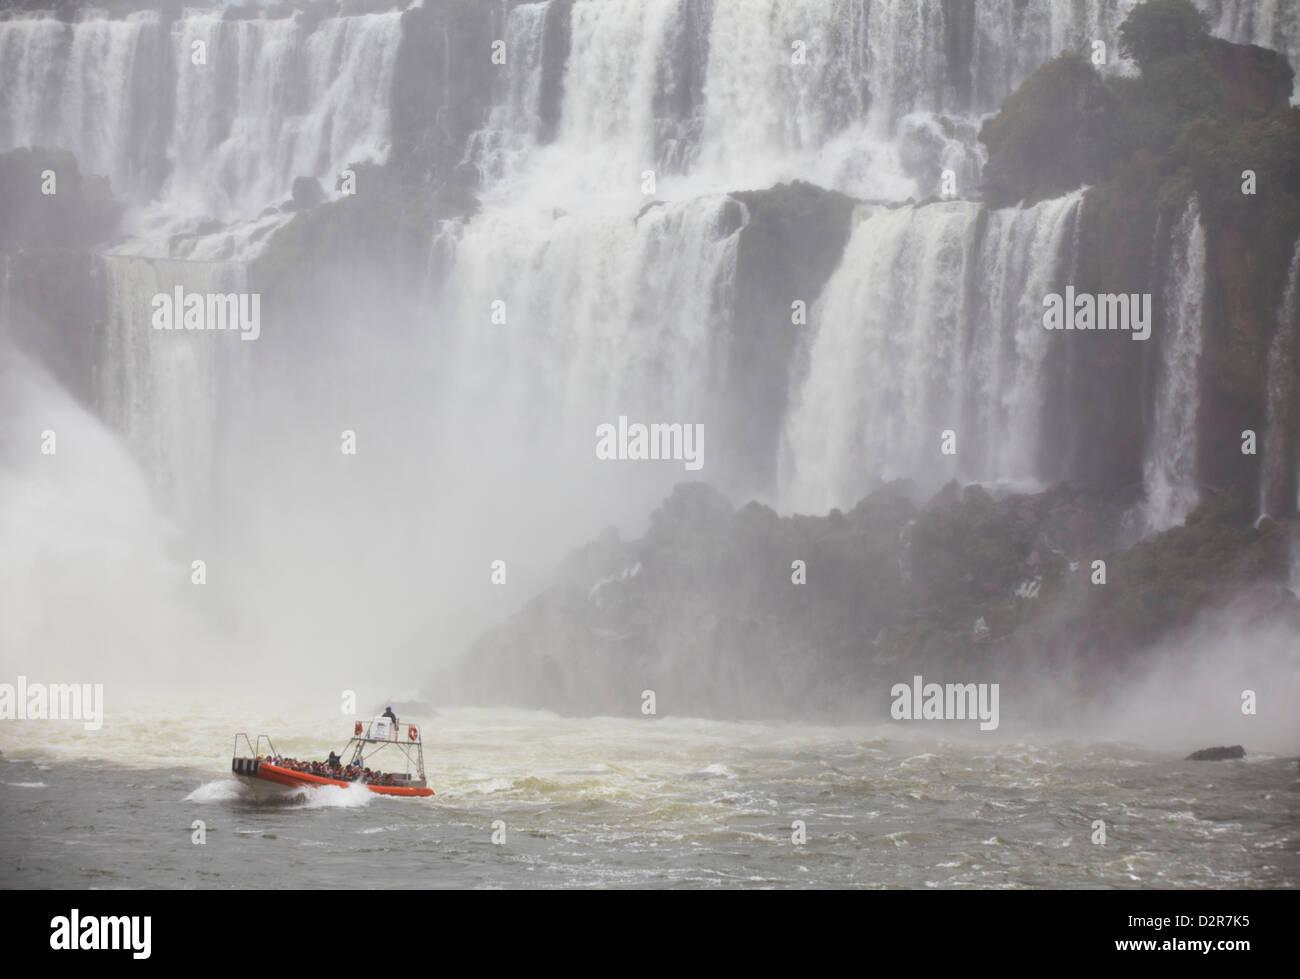 Tourist boat at Iguazu Falls, Iguazu National Park, UNESCO World Heritage Site, Misiones, Argentina, South America - Stock Image